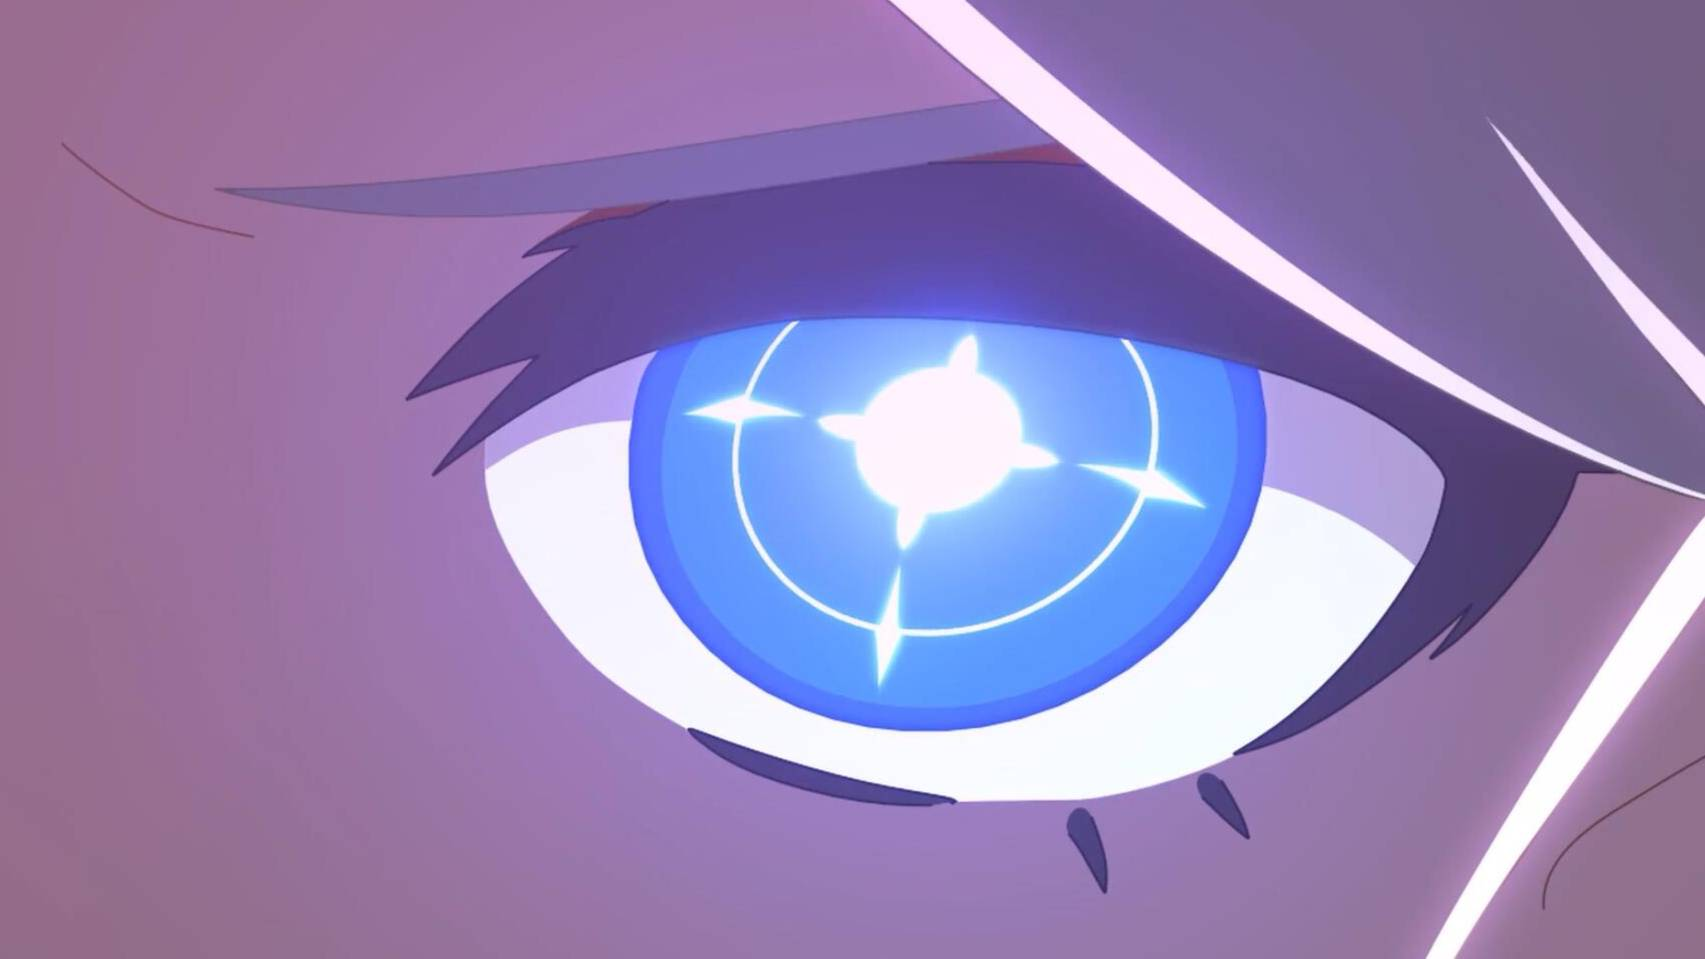 【Starfall/崩坏三】琪亚娜,该回家了,快回到休伯利安吧